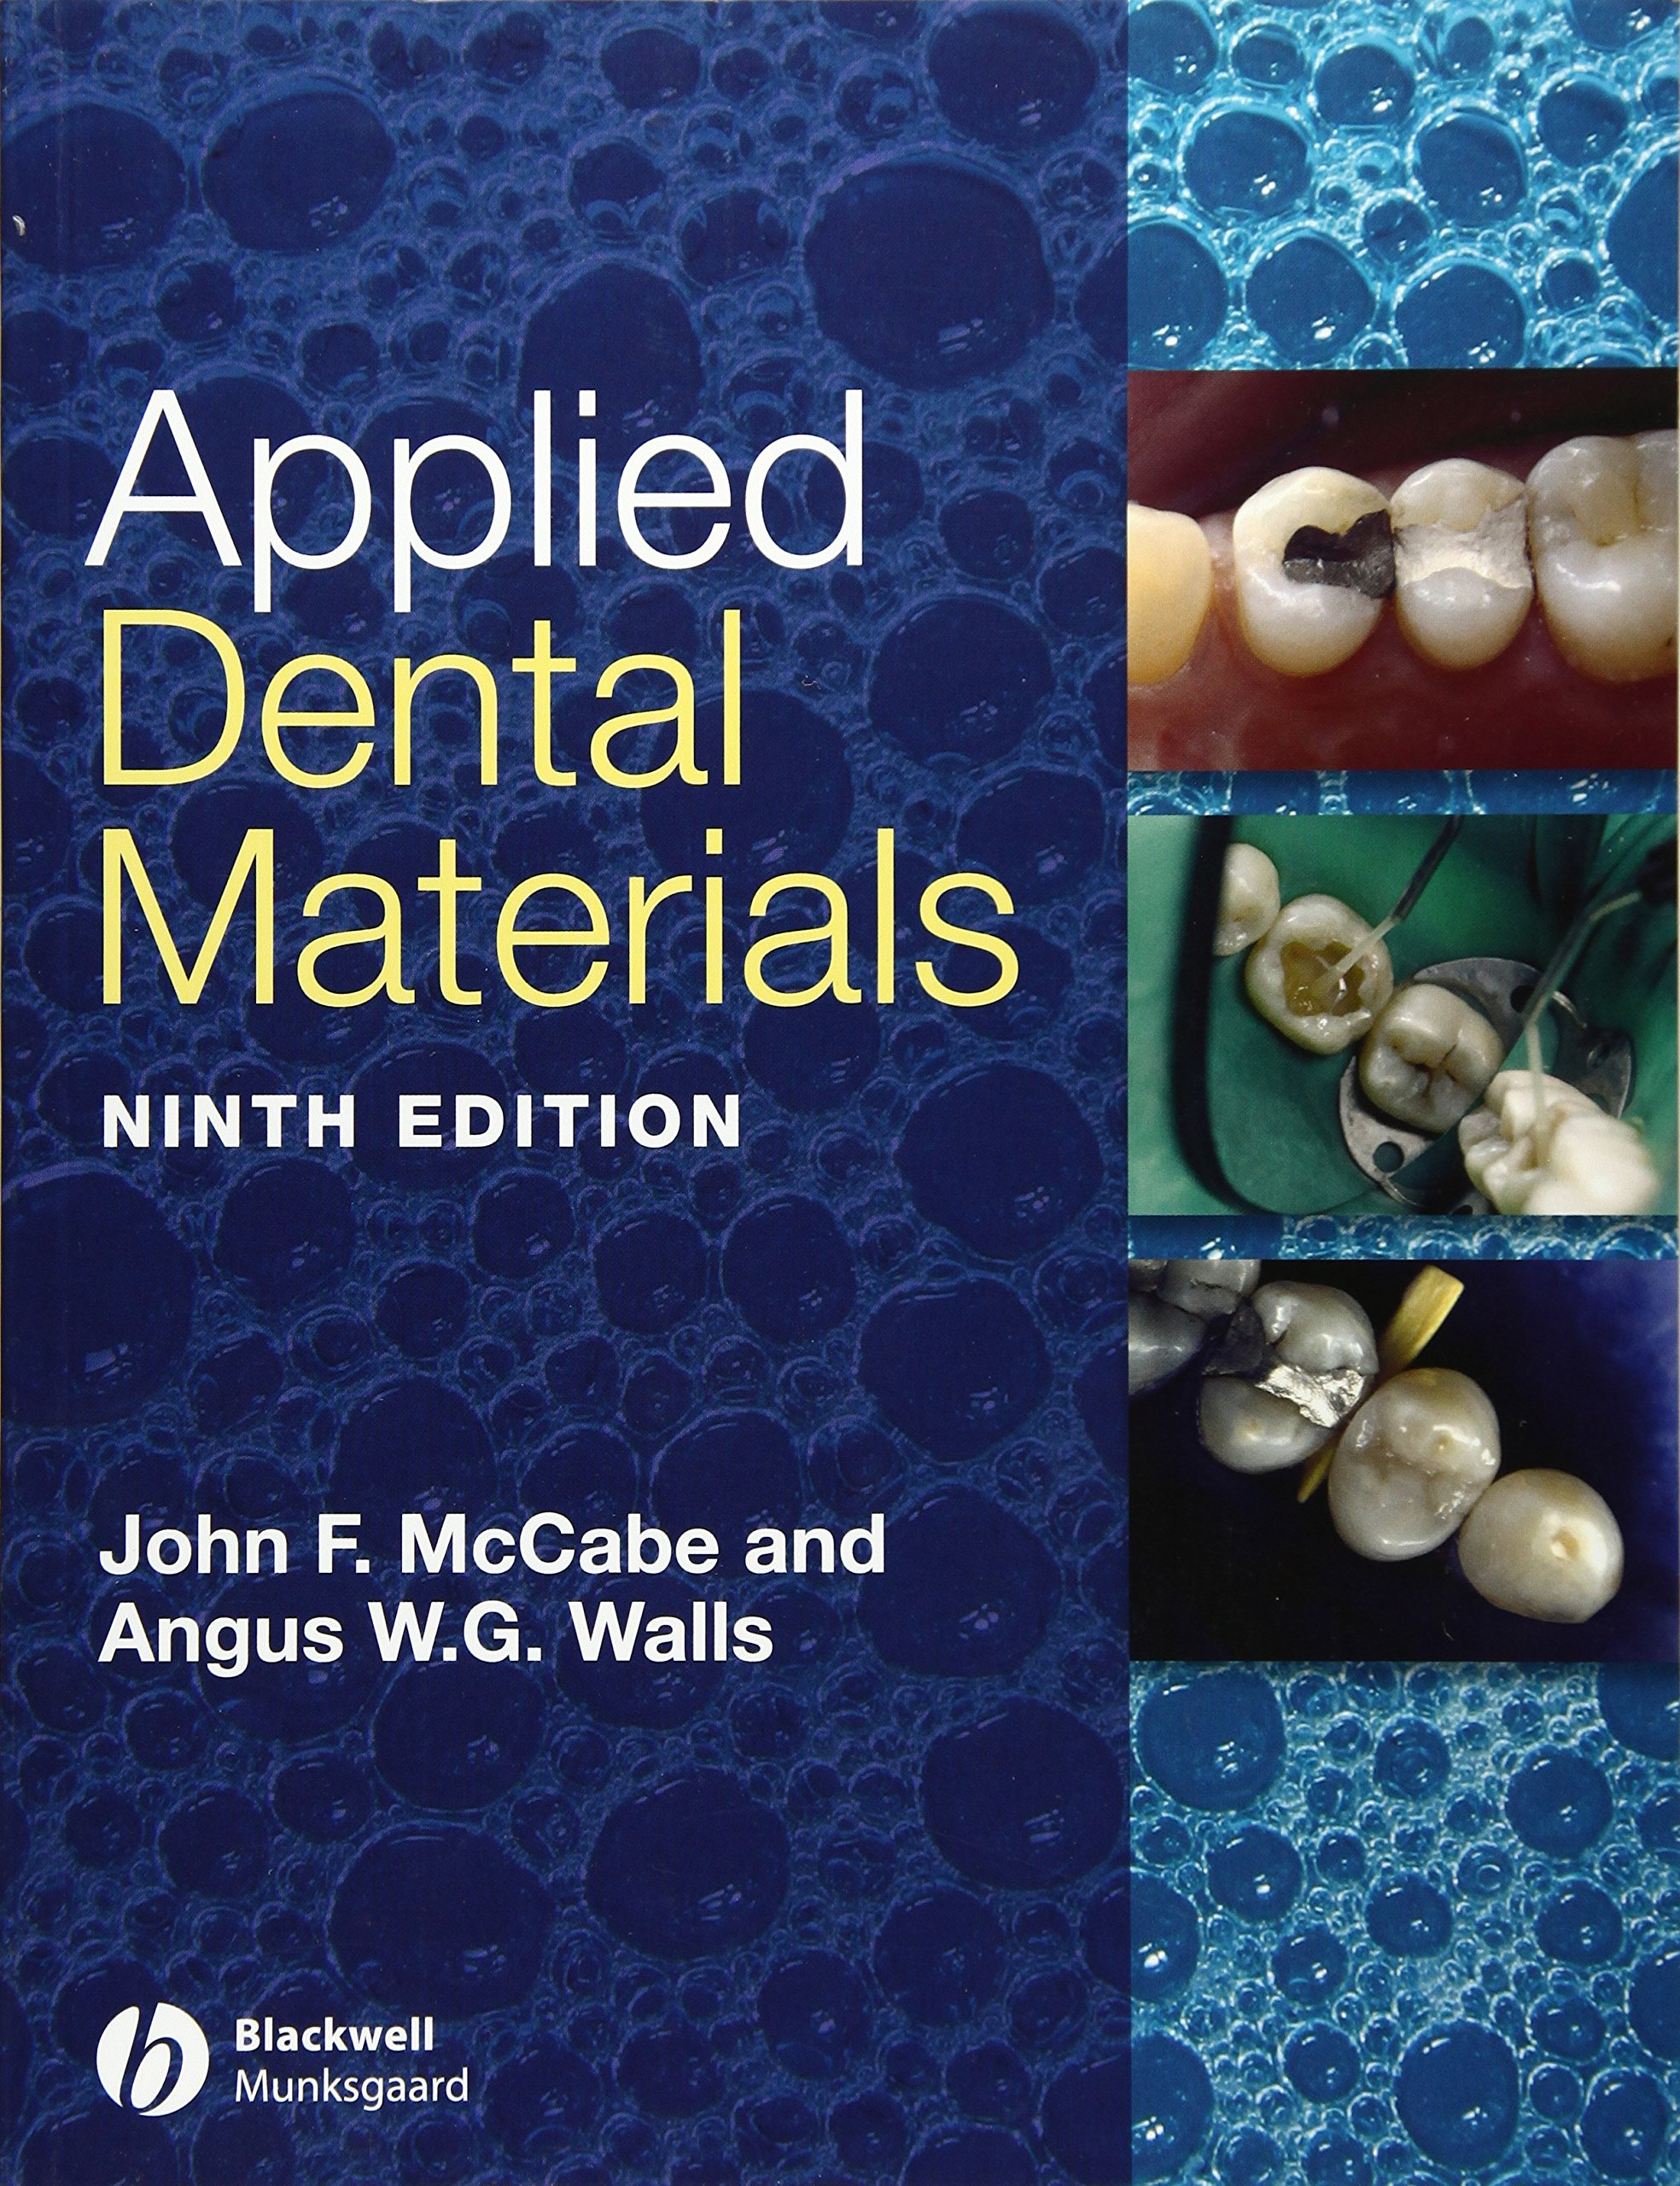 Applied Dental Materials, 9th Edition: Amazon.co.uk: John F. McCabe ...